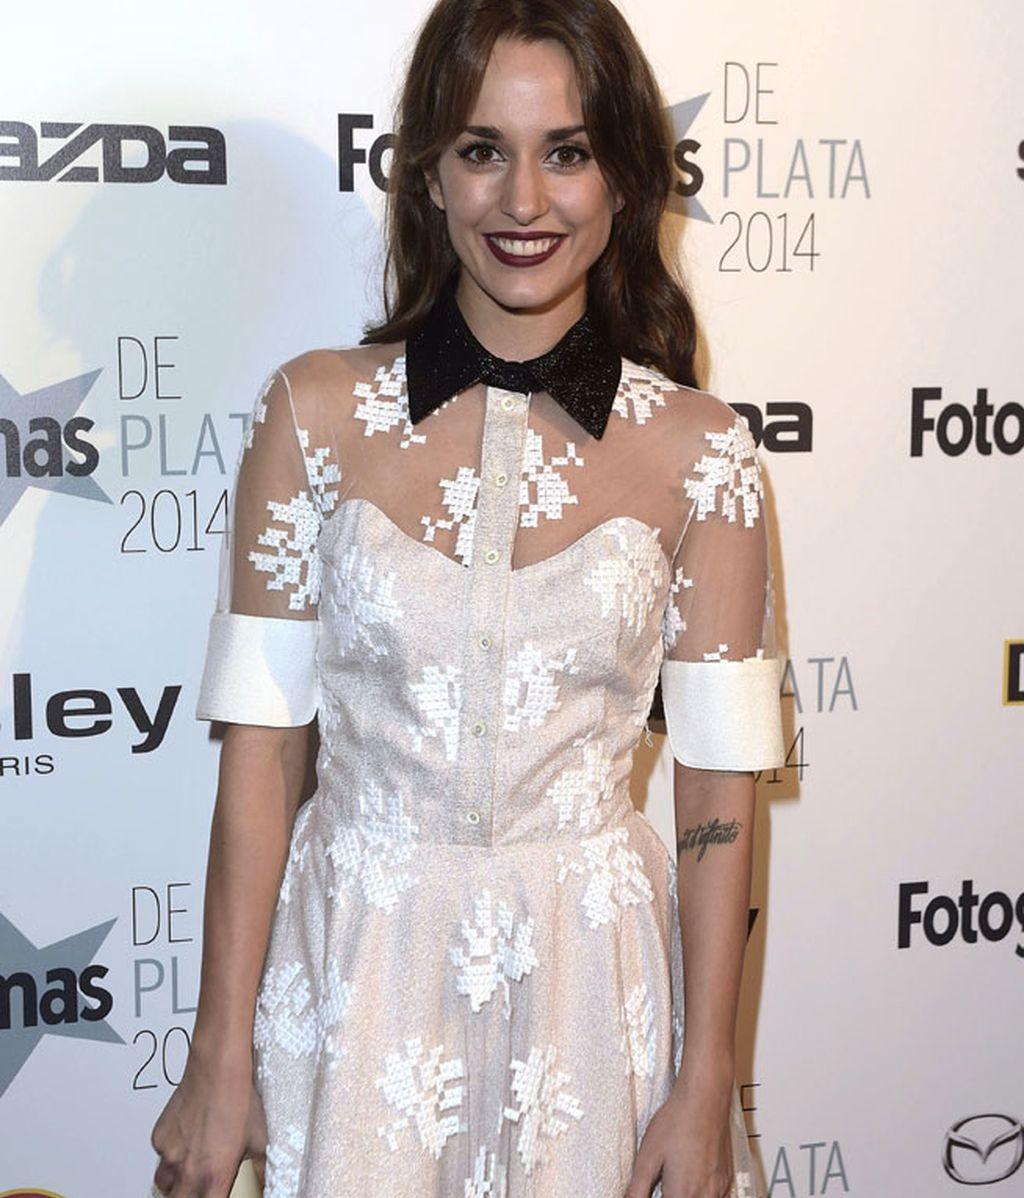 La actriz Silvia Alonso con un gloss oscuro